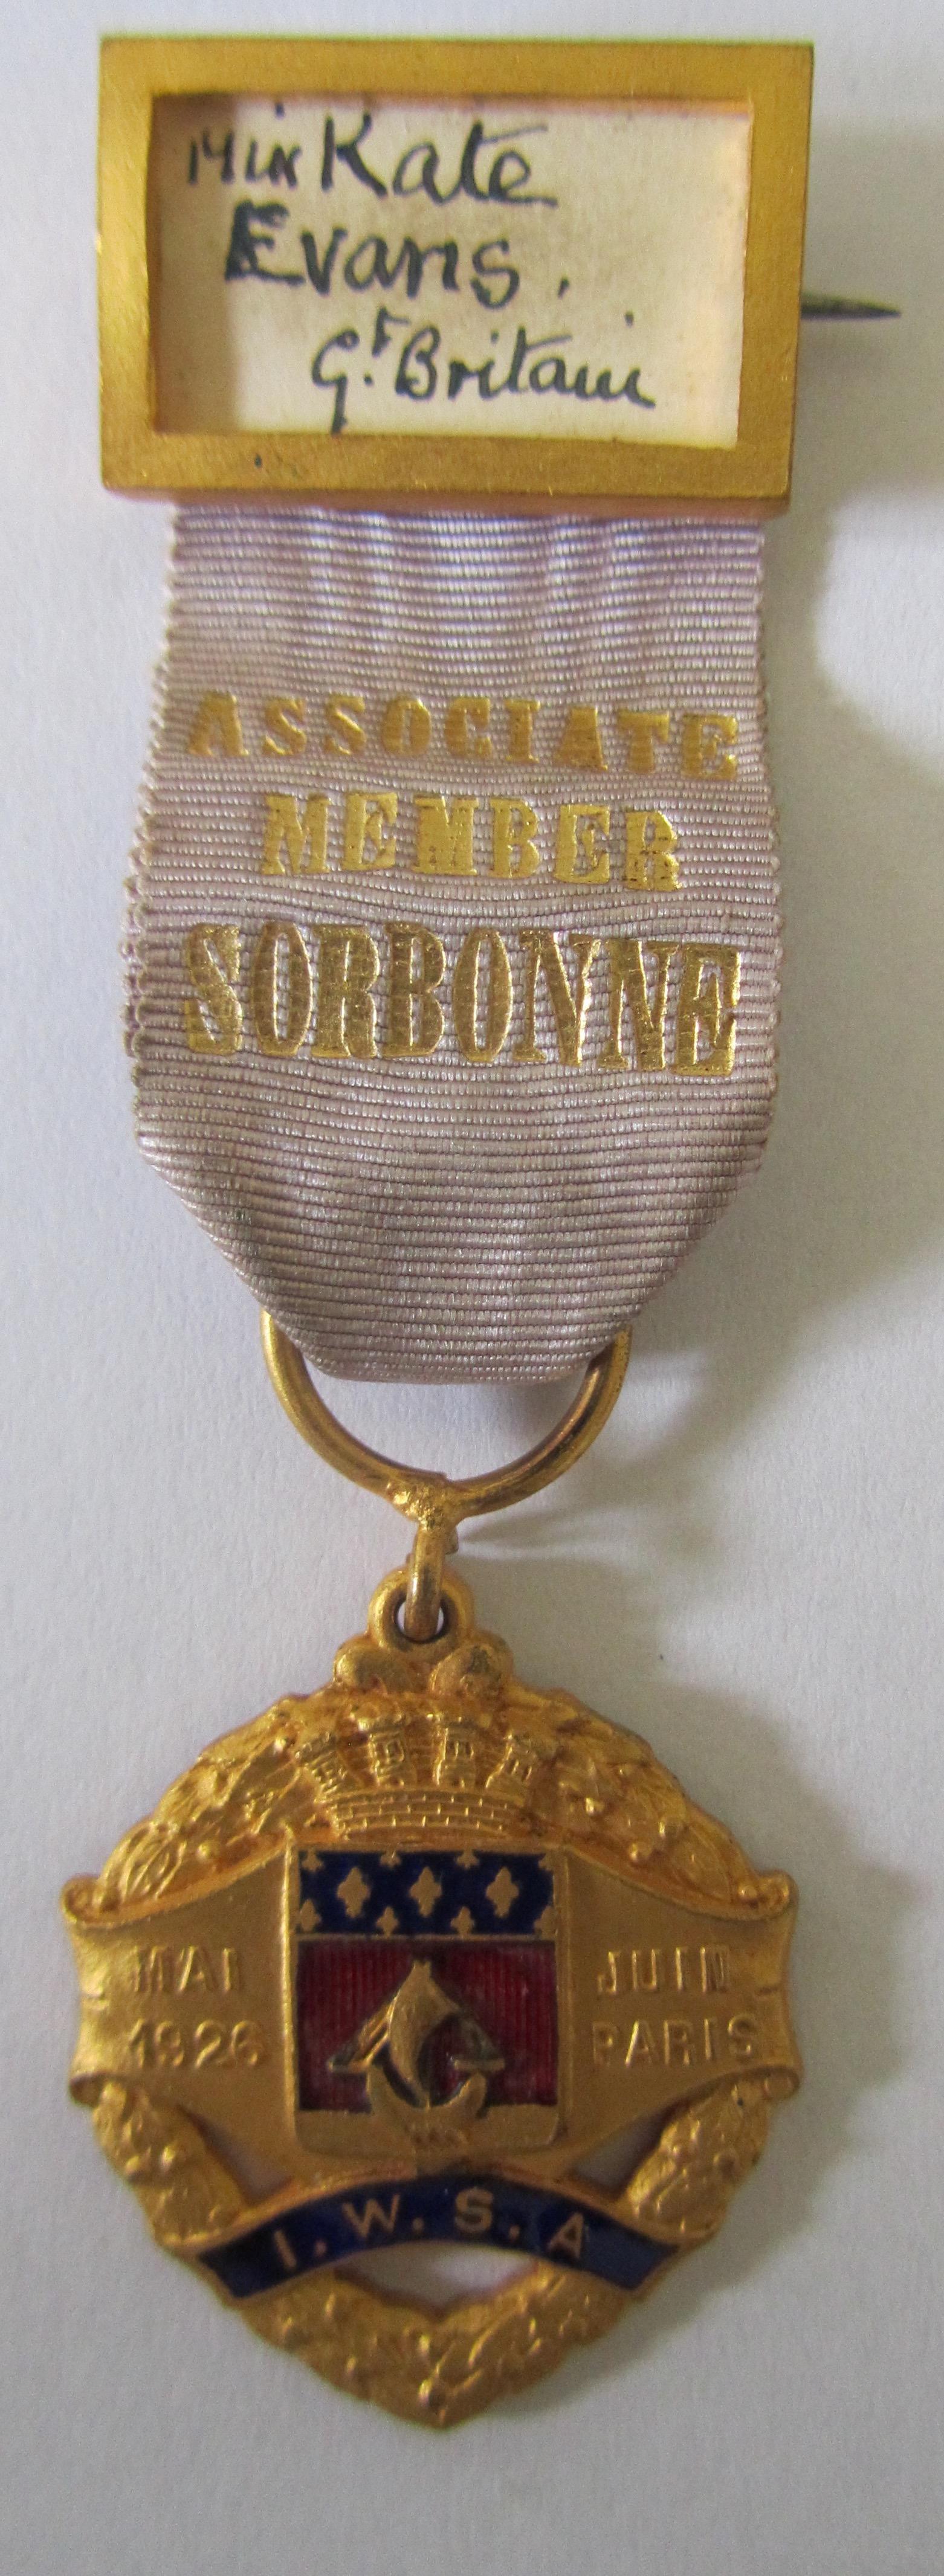 Lot 249 - A rare silver suffragette Hunger Strike medal & archive re Kate Evans